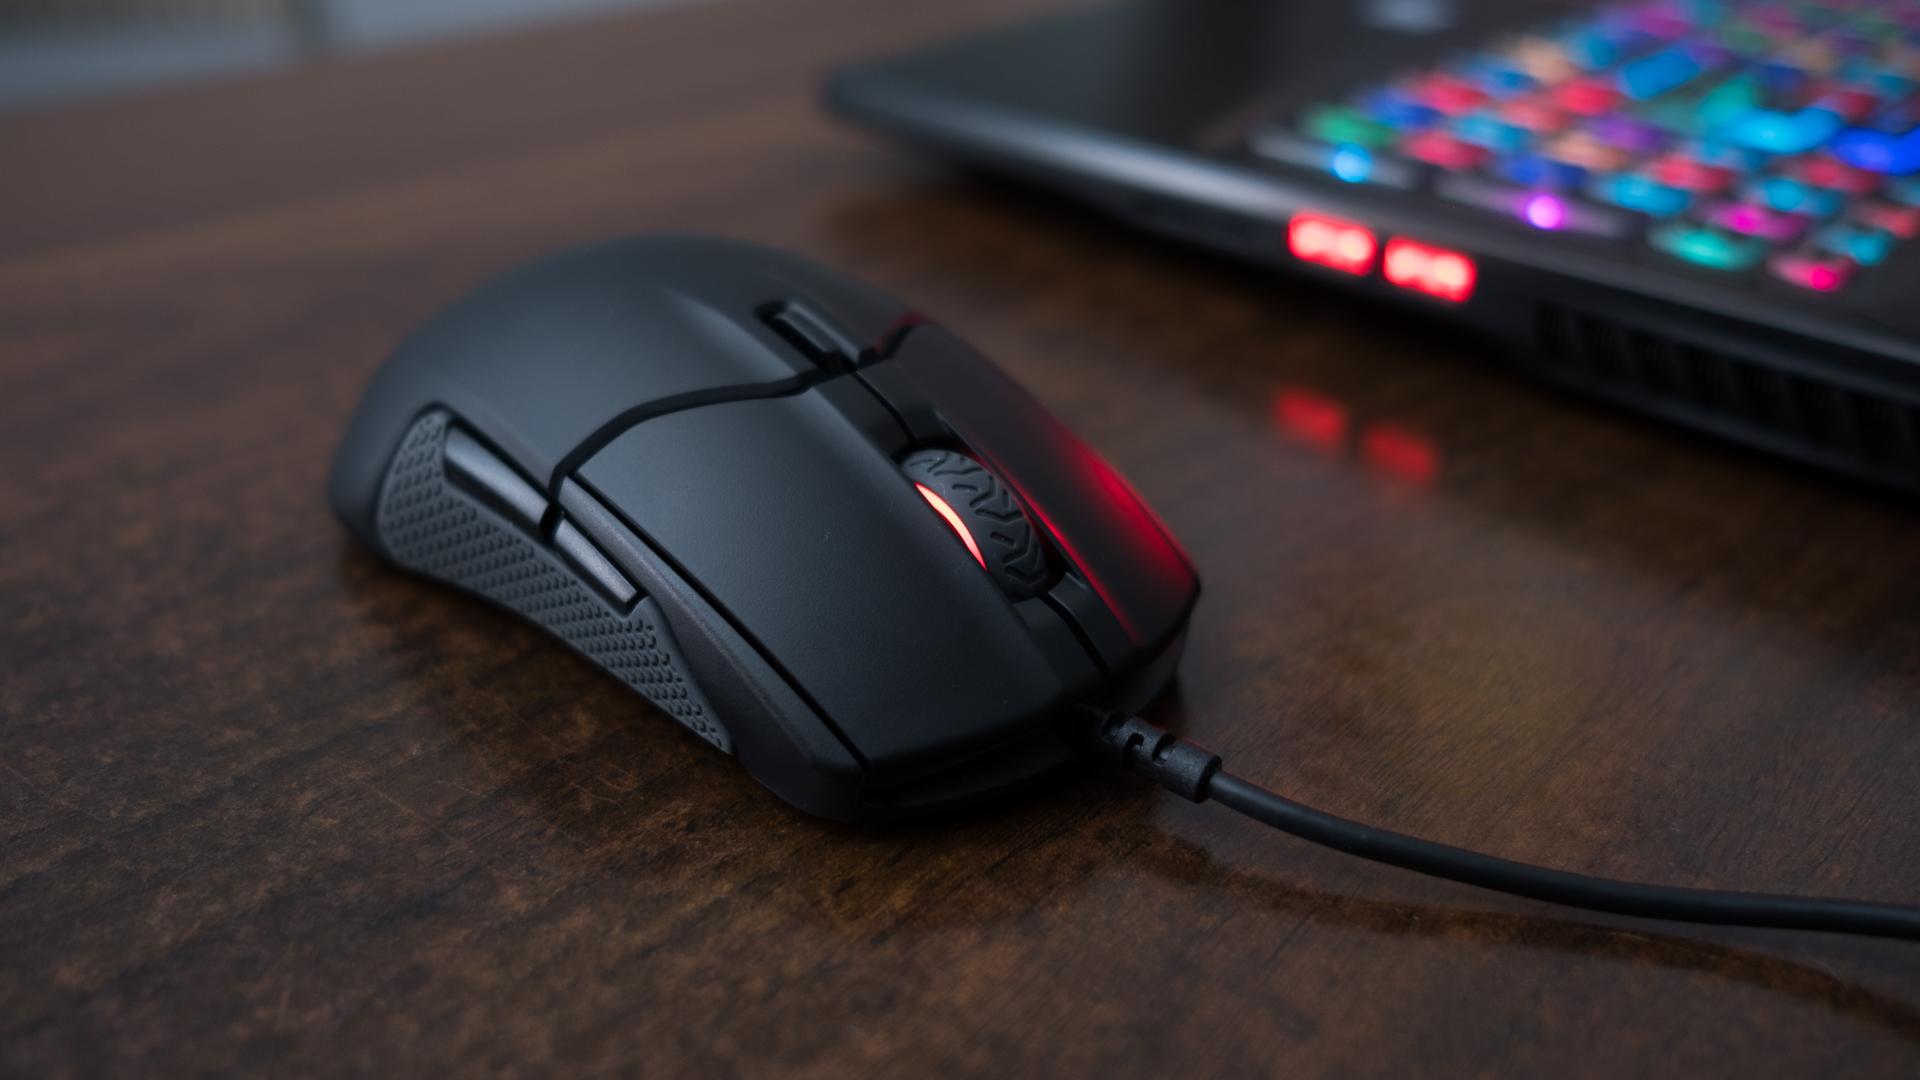 SteelSeries Sensei 310 mouse